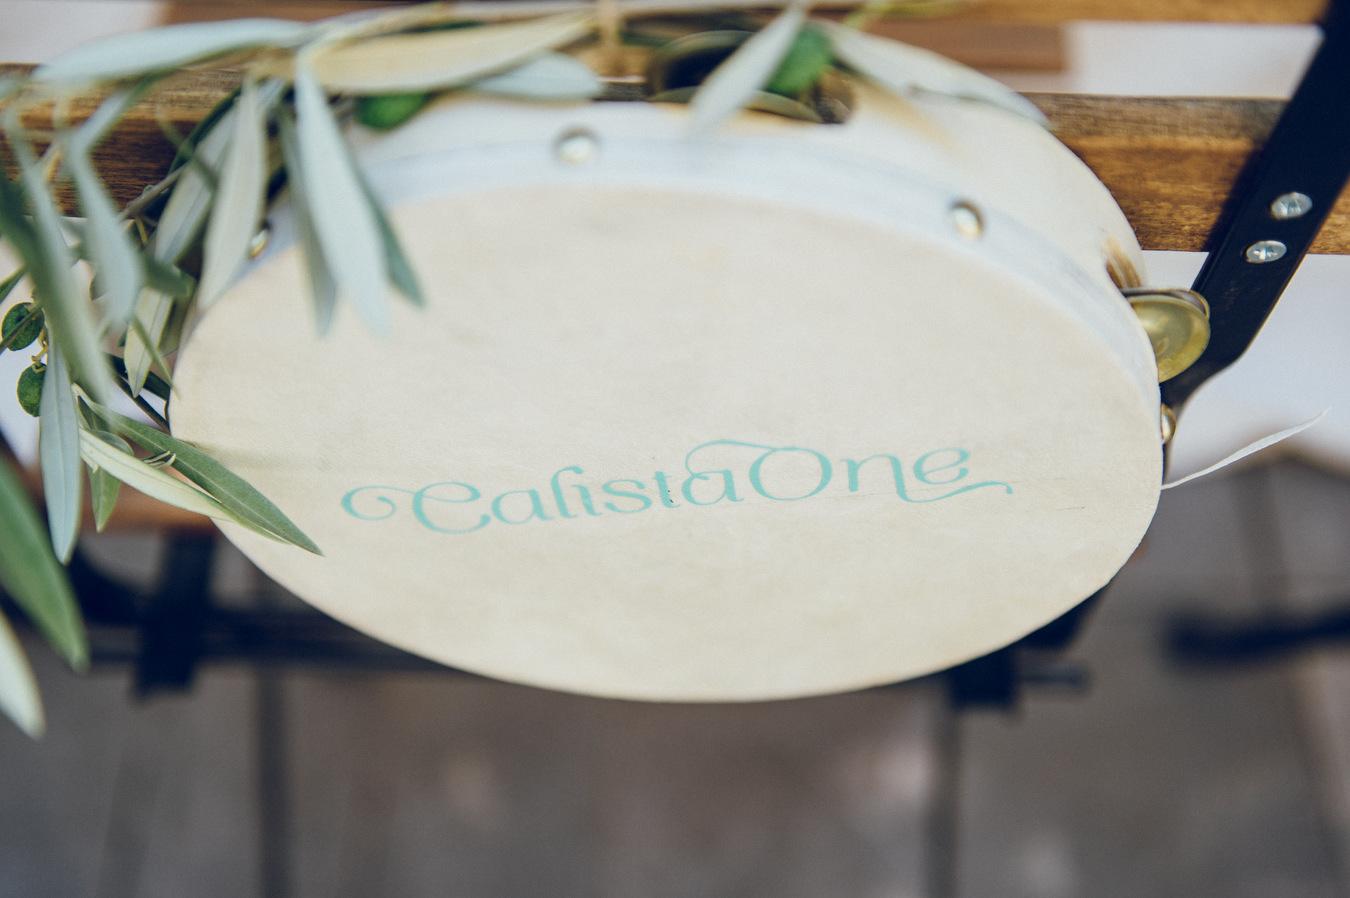 calista-one-lista-de-bodas-online-blog-de-bodas-calista-one-summer-party-2016-wedding-planner-dpleis-2